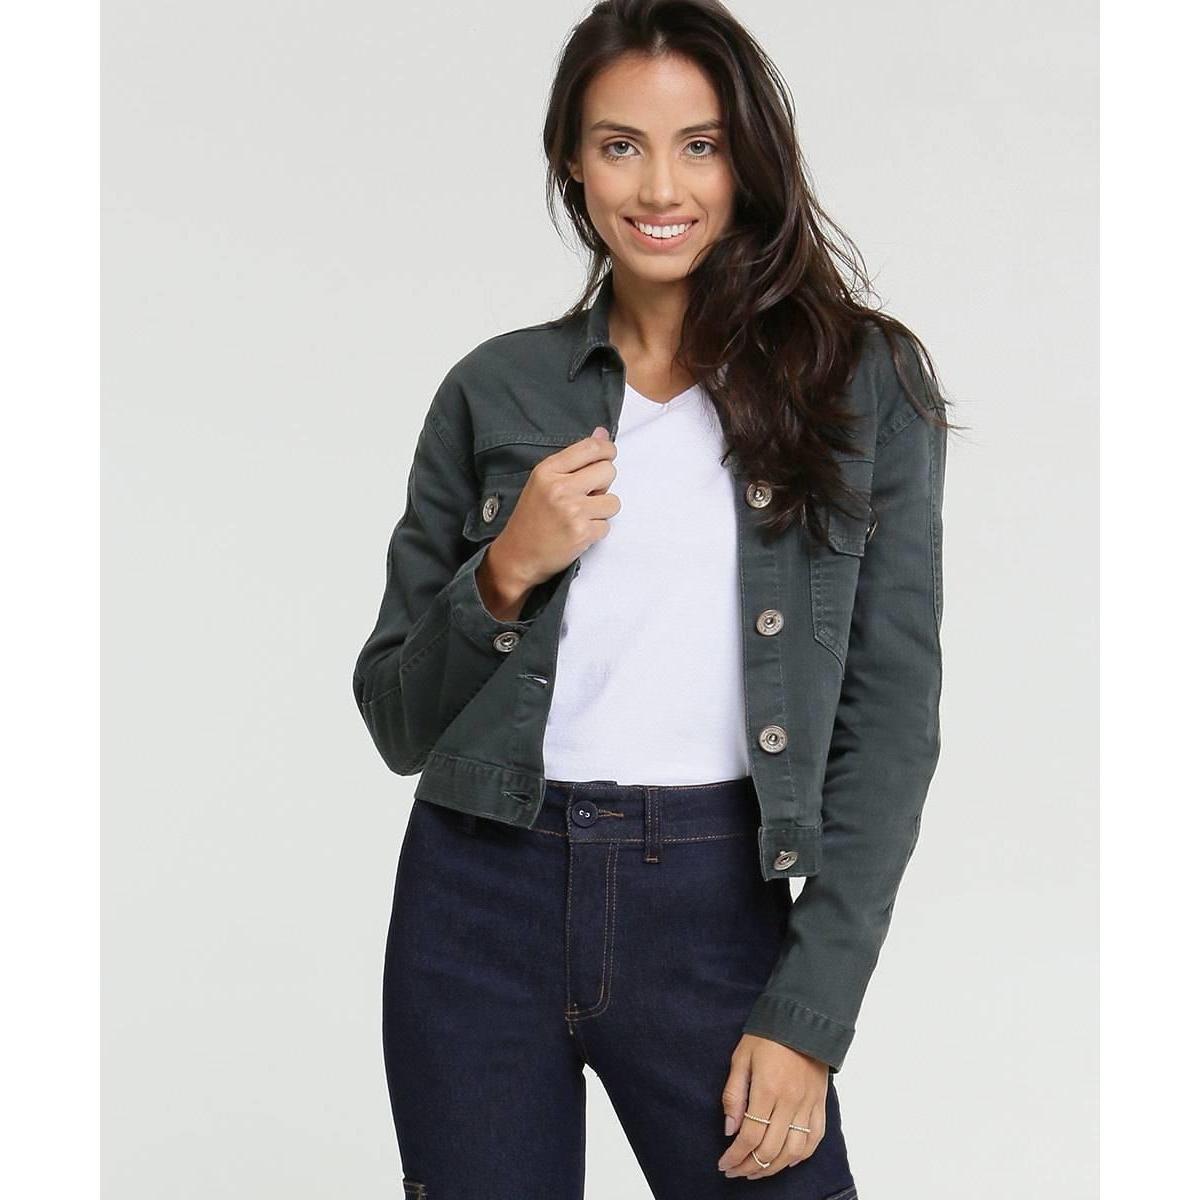 Jaqueta Jeans Doct Cropped Feminina - Cinza